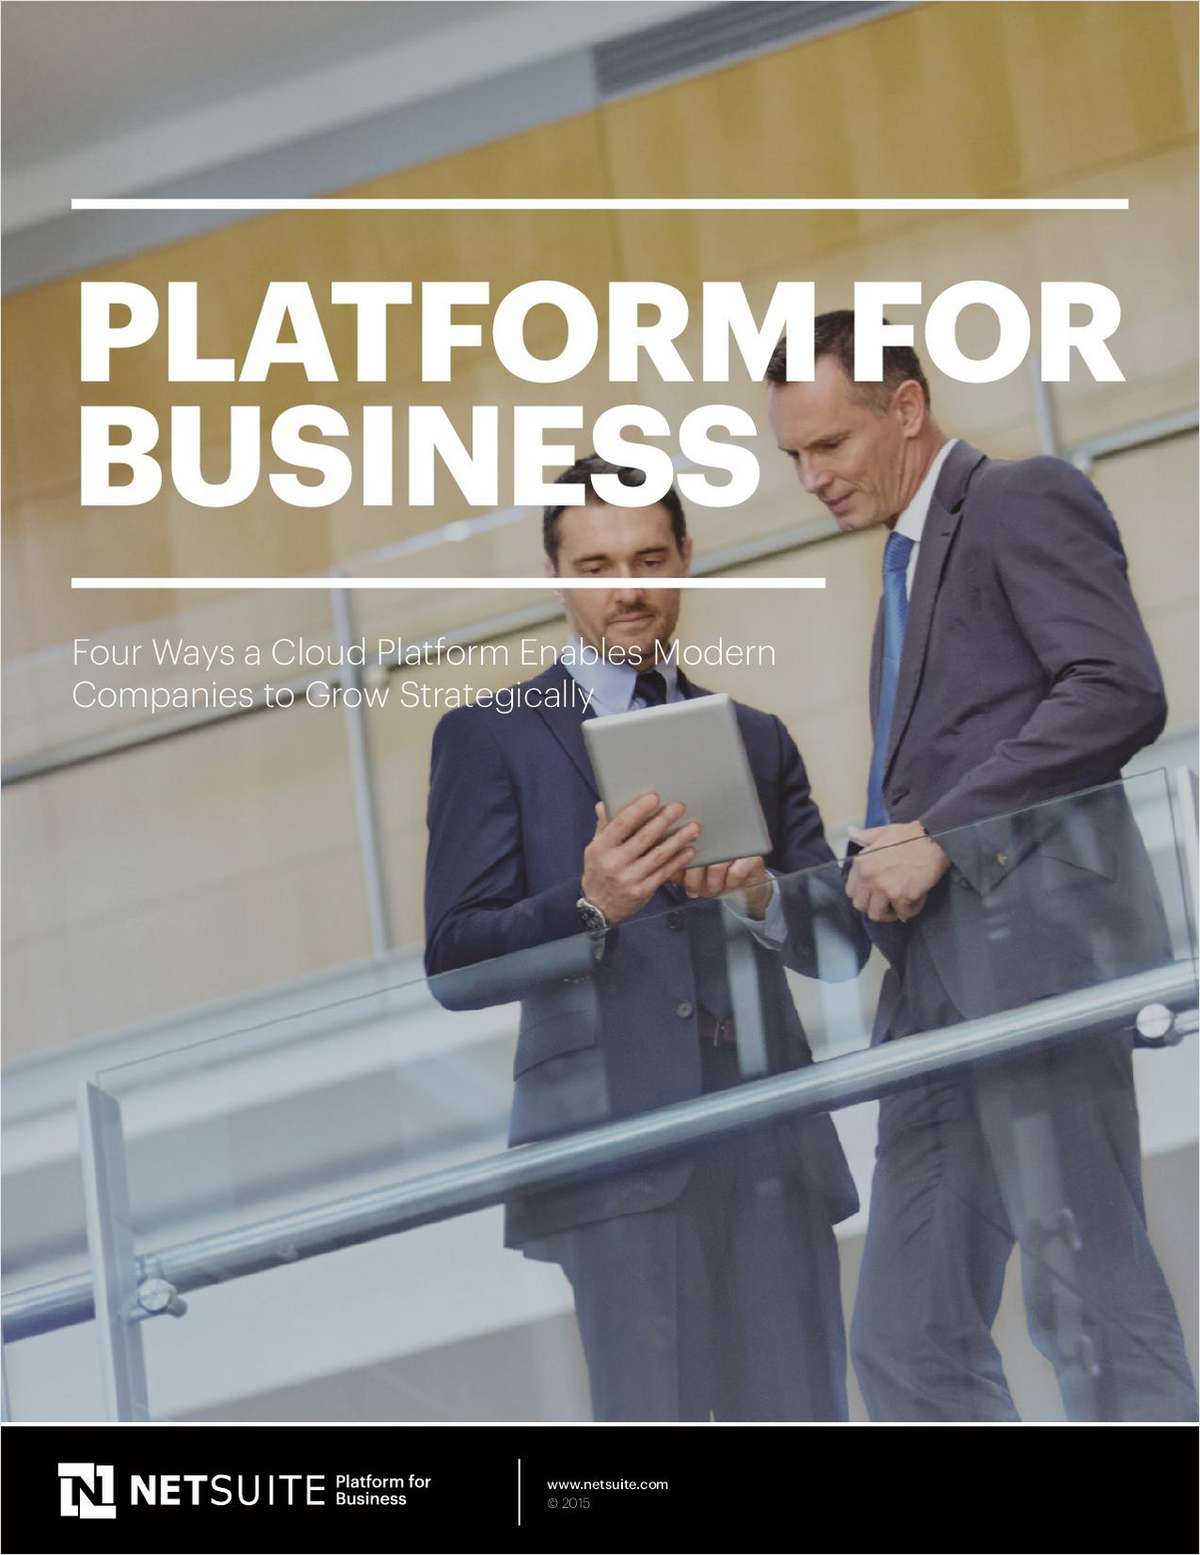 Cloud Platform for Business